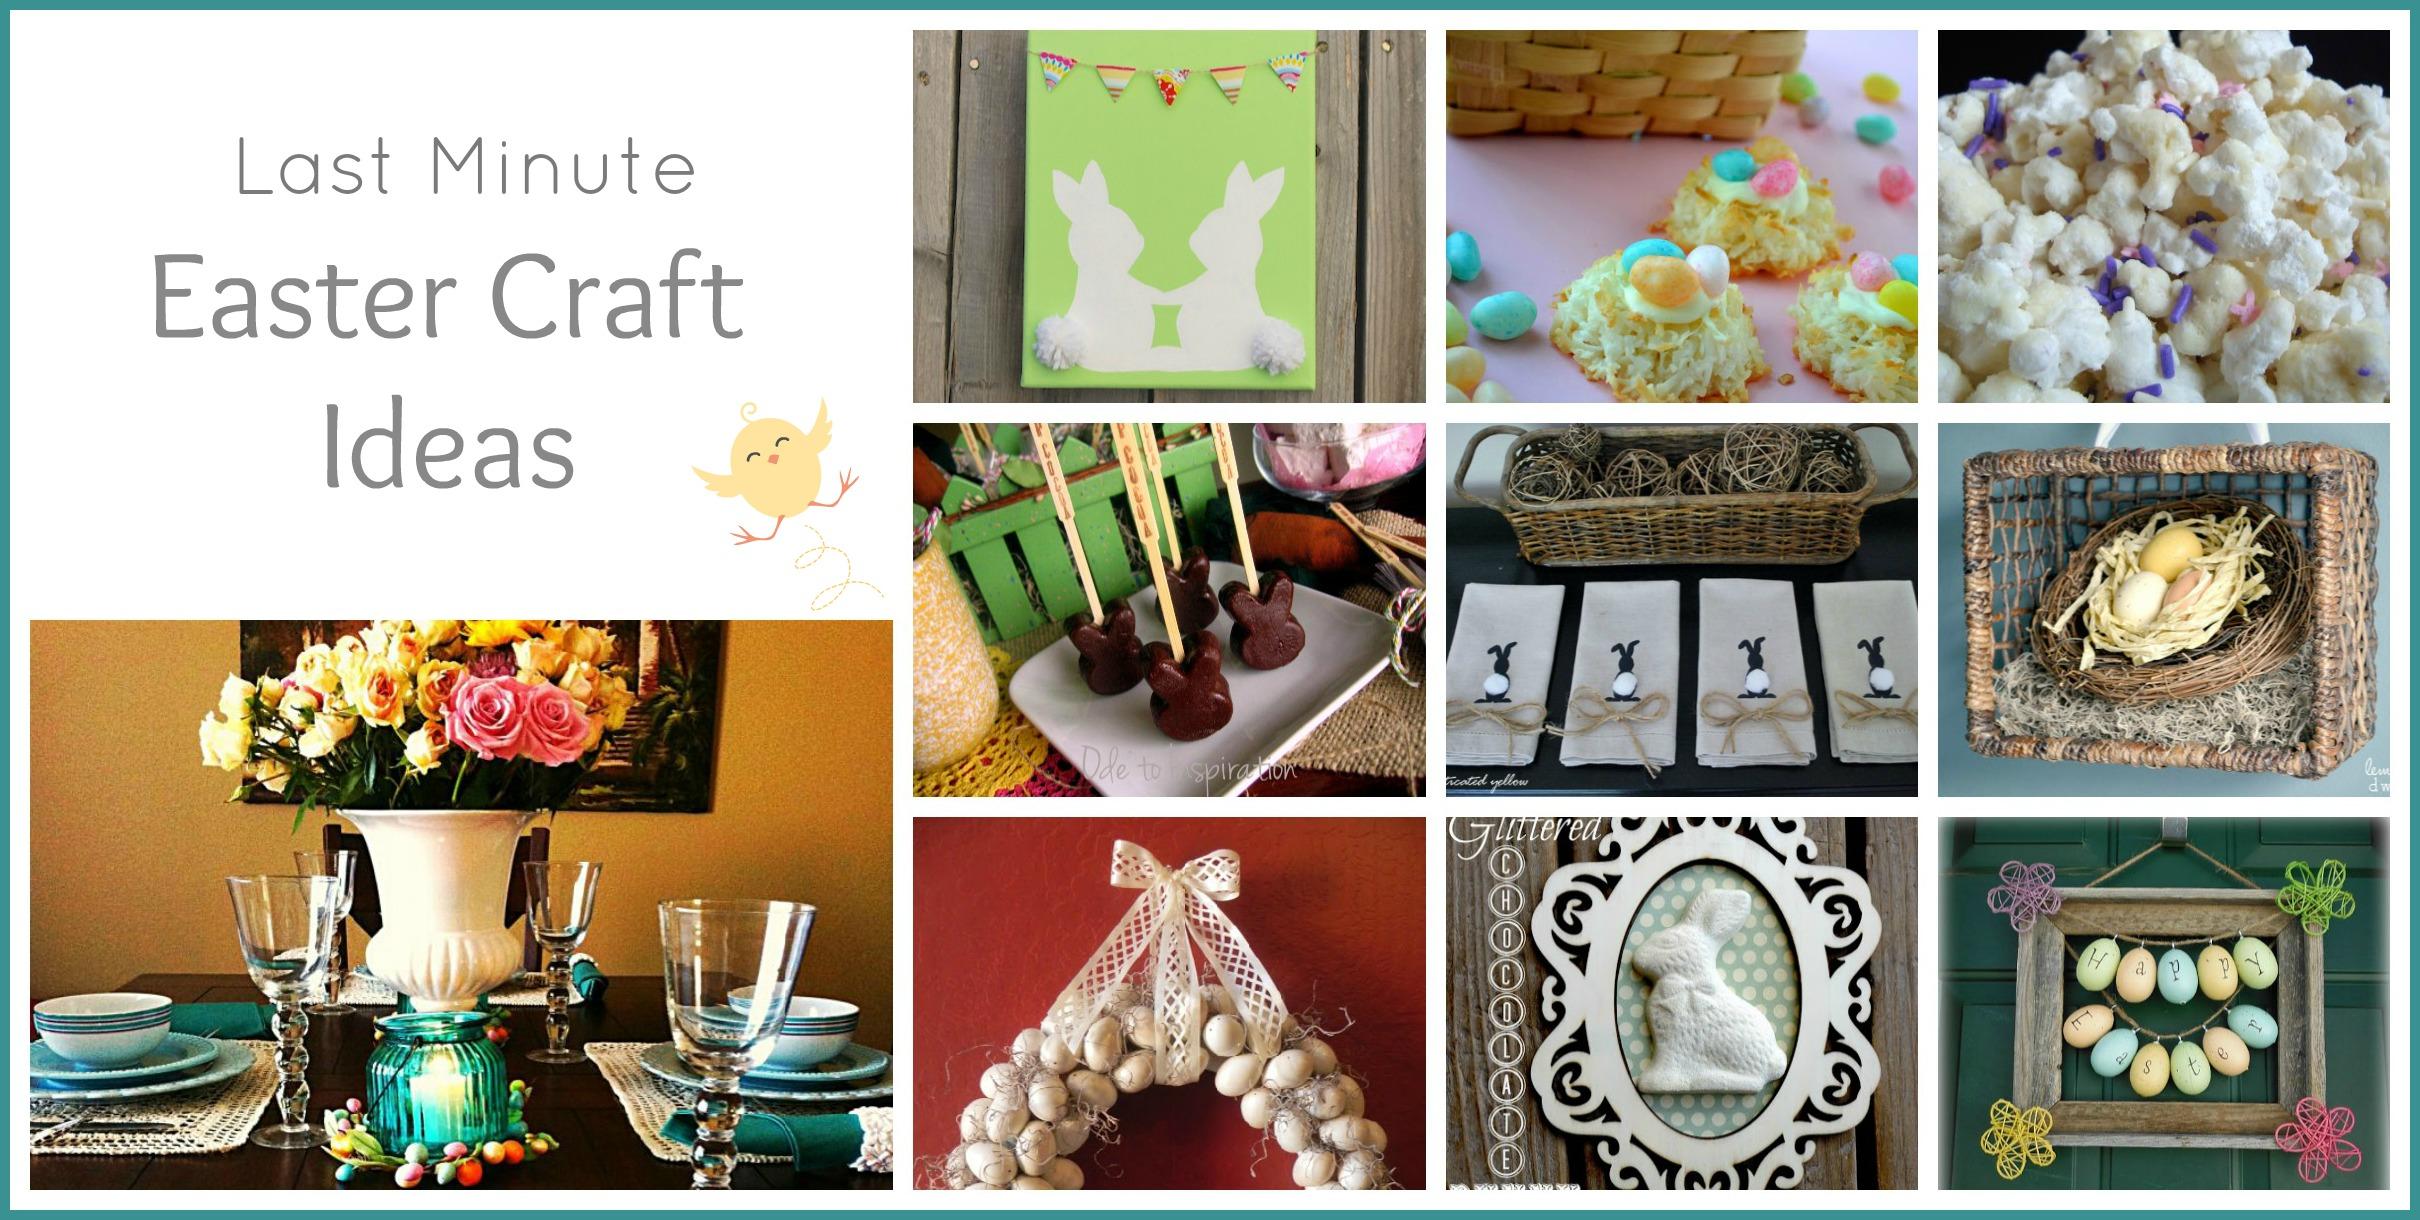 Last Minute Diy Easter Crafts